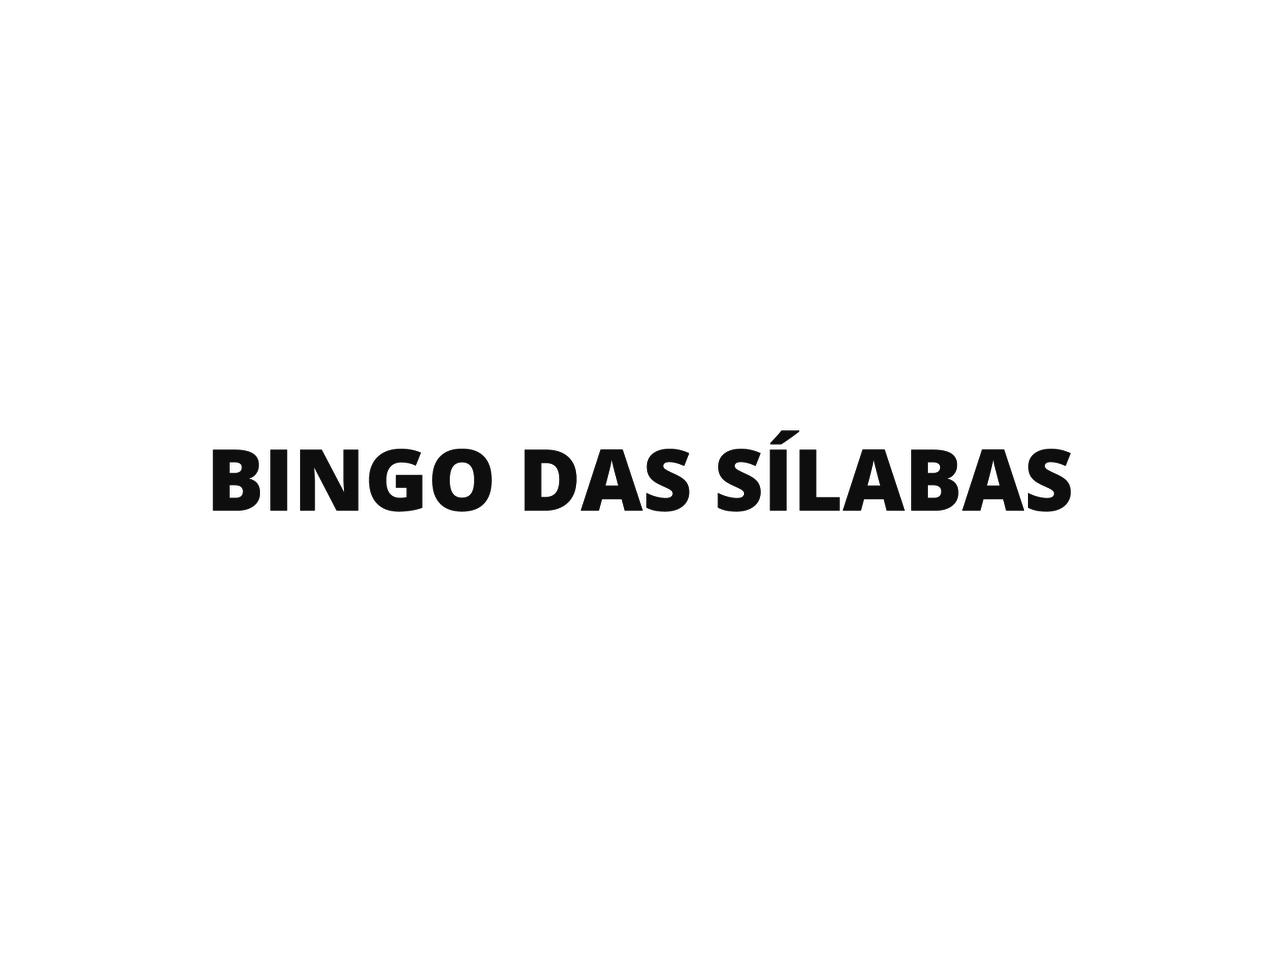 Plano De Aula 1º Ano Lingua Portuguesa Bingo Das Silabas